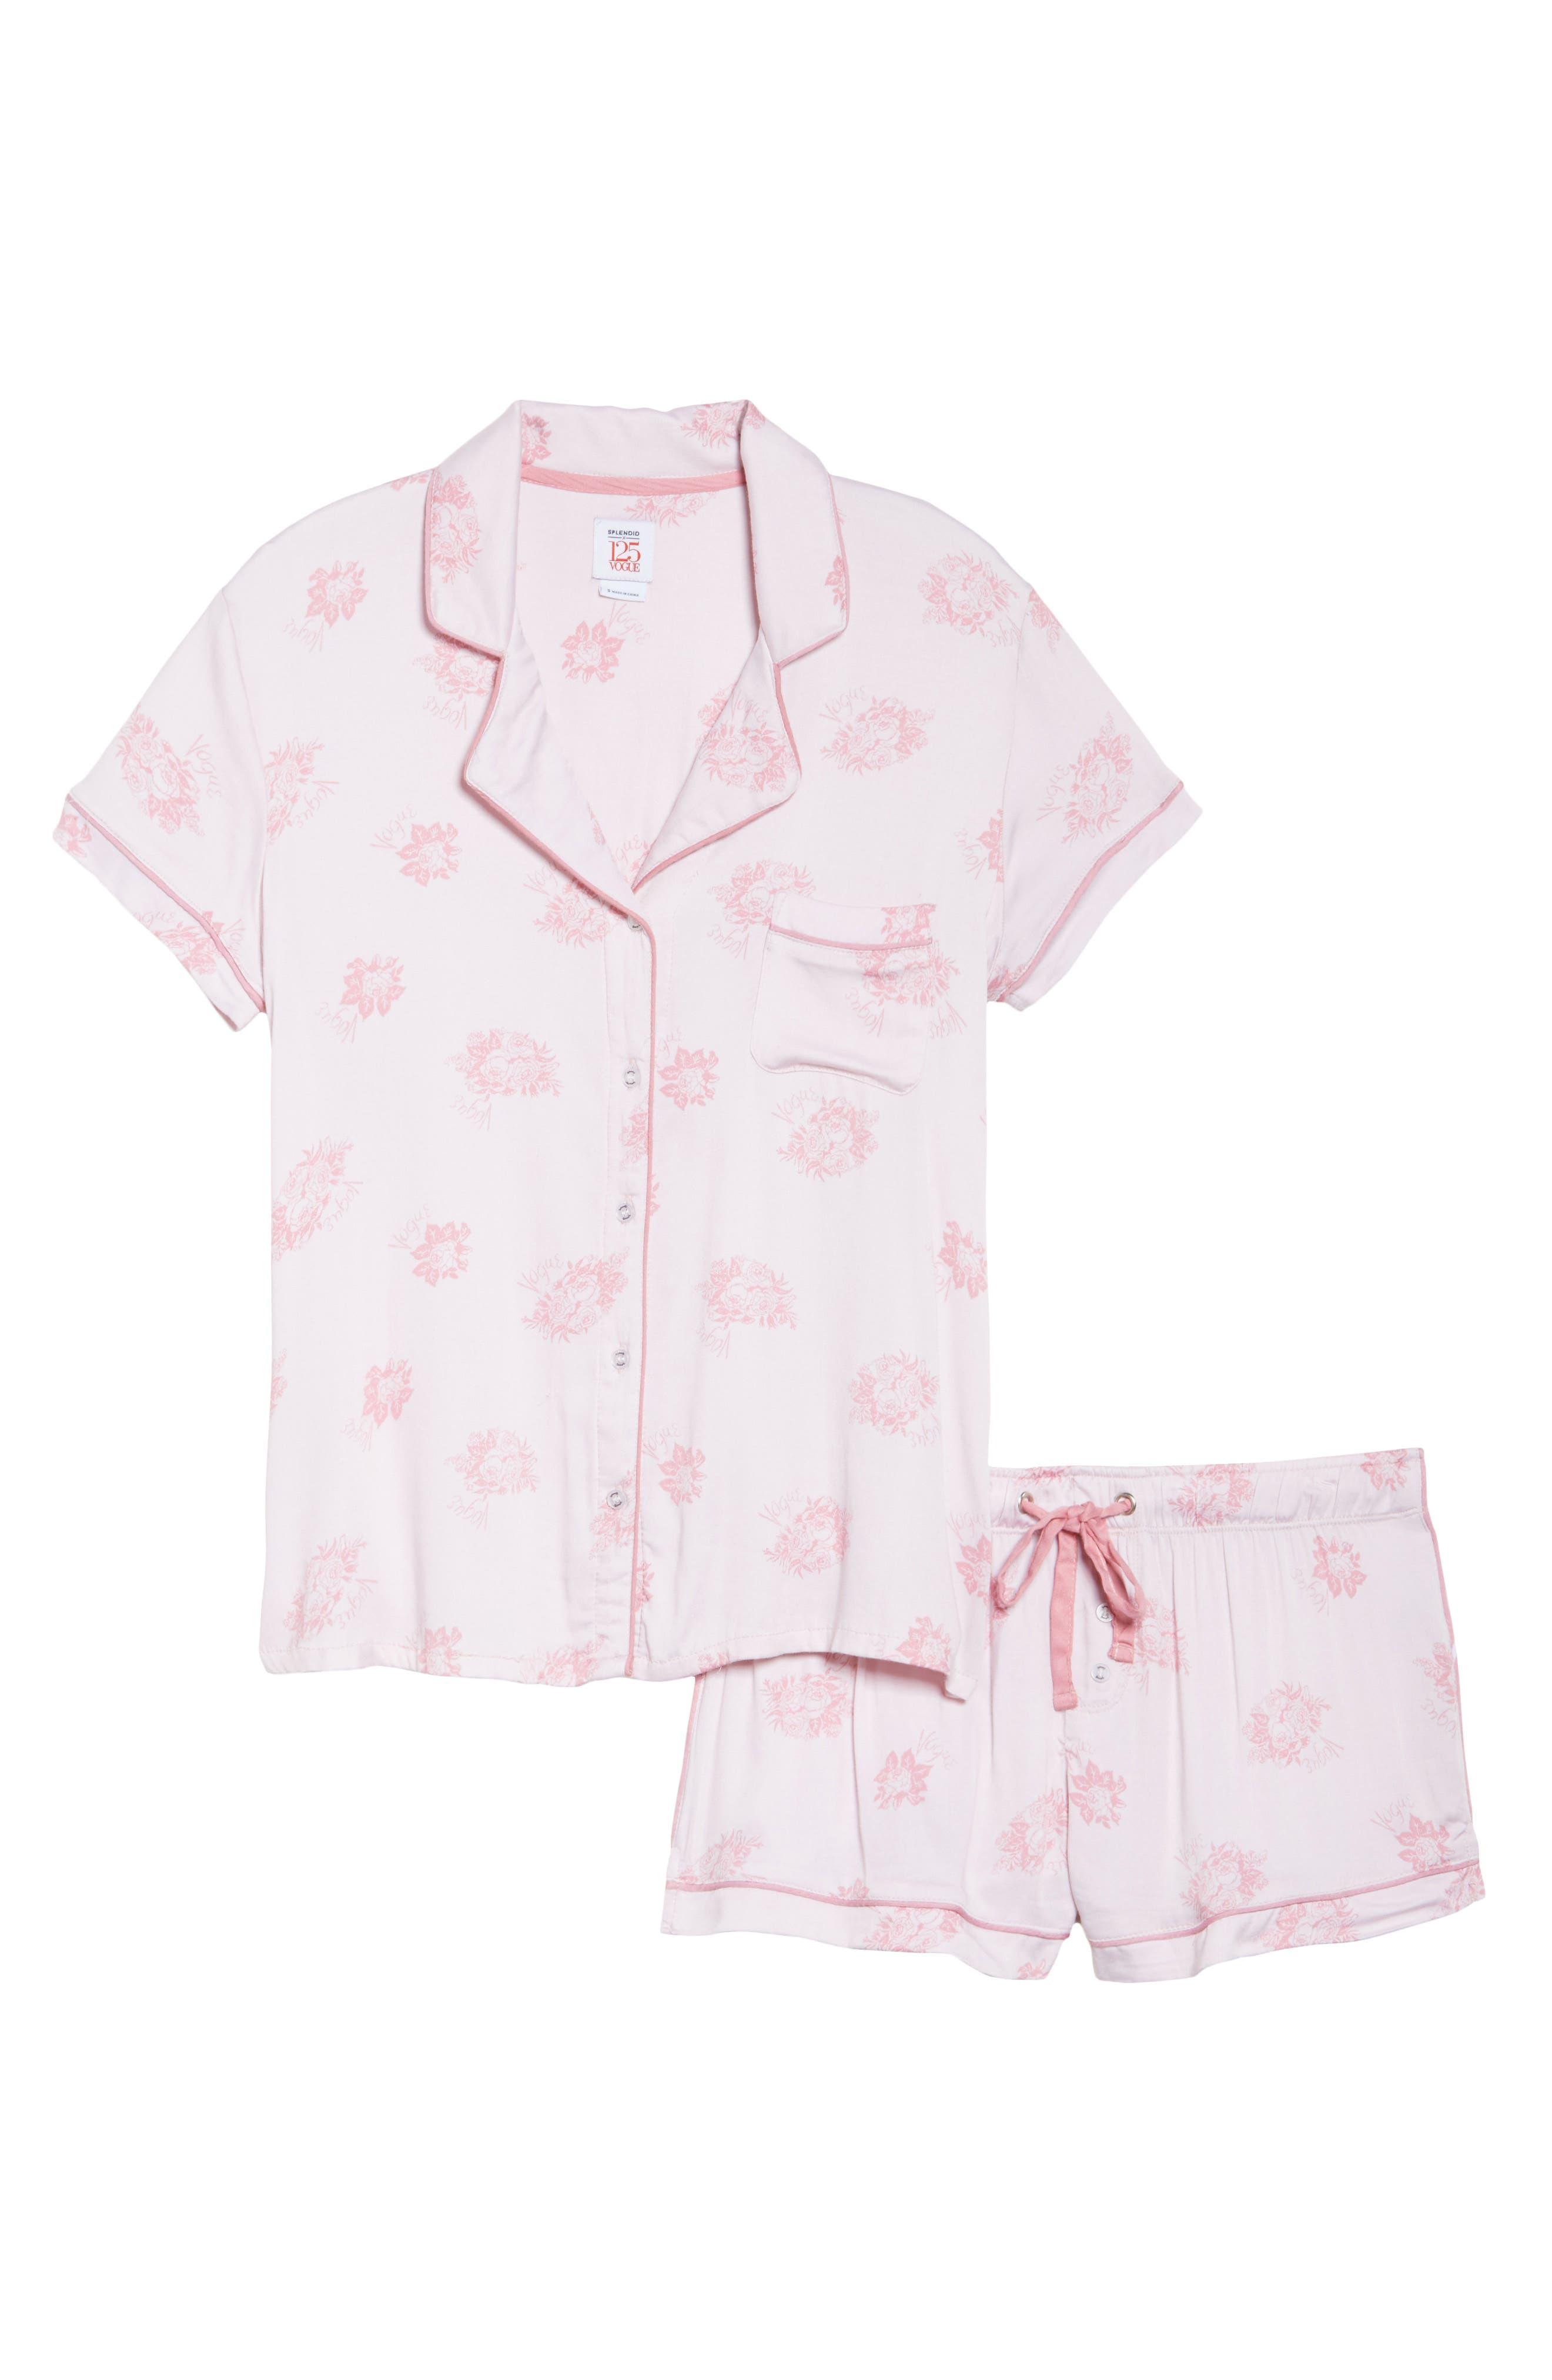 Shortie Pajamas,                             Alternate thumbnail 12, color,